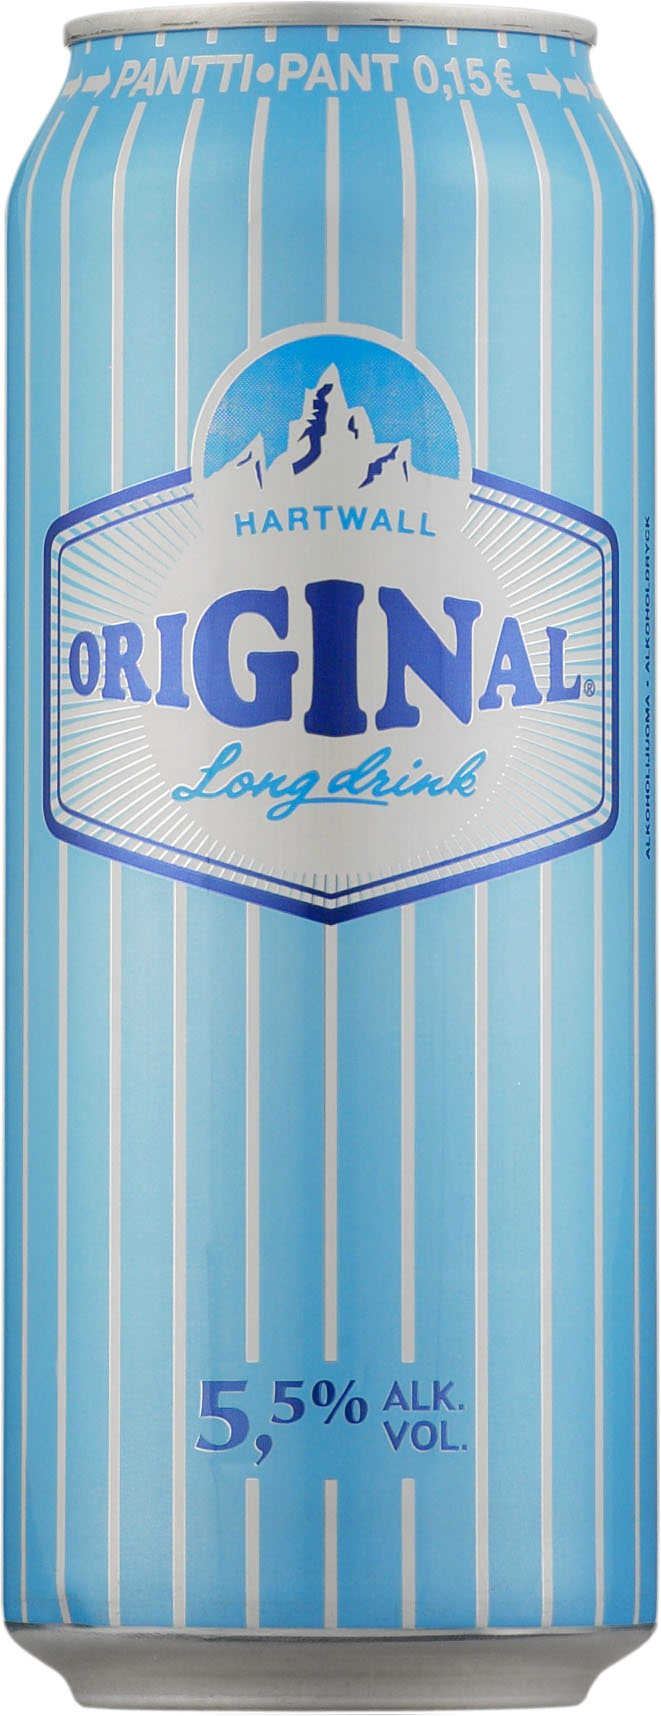 Original Long Drink tölkki (0.5 l) - long drinkit - Suomi - 700346 - Viinikartta.fi